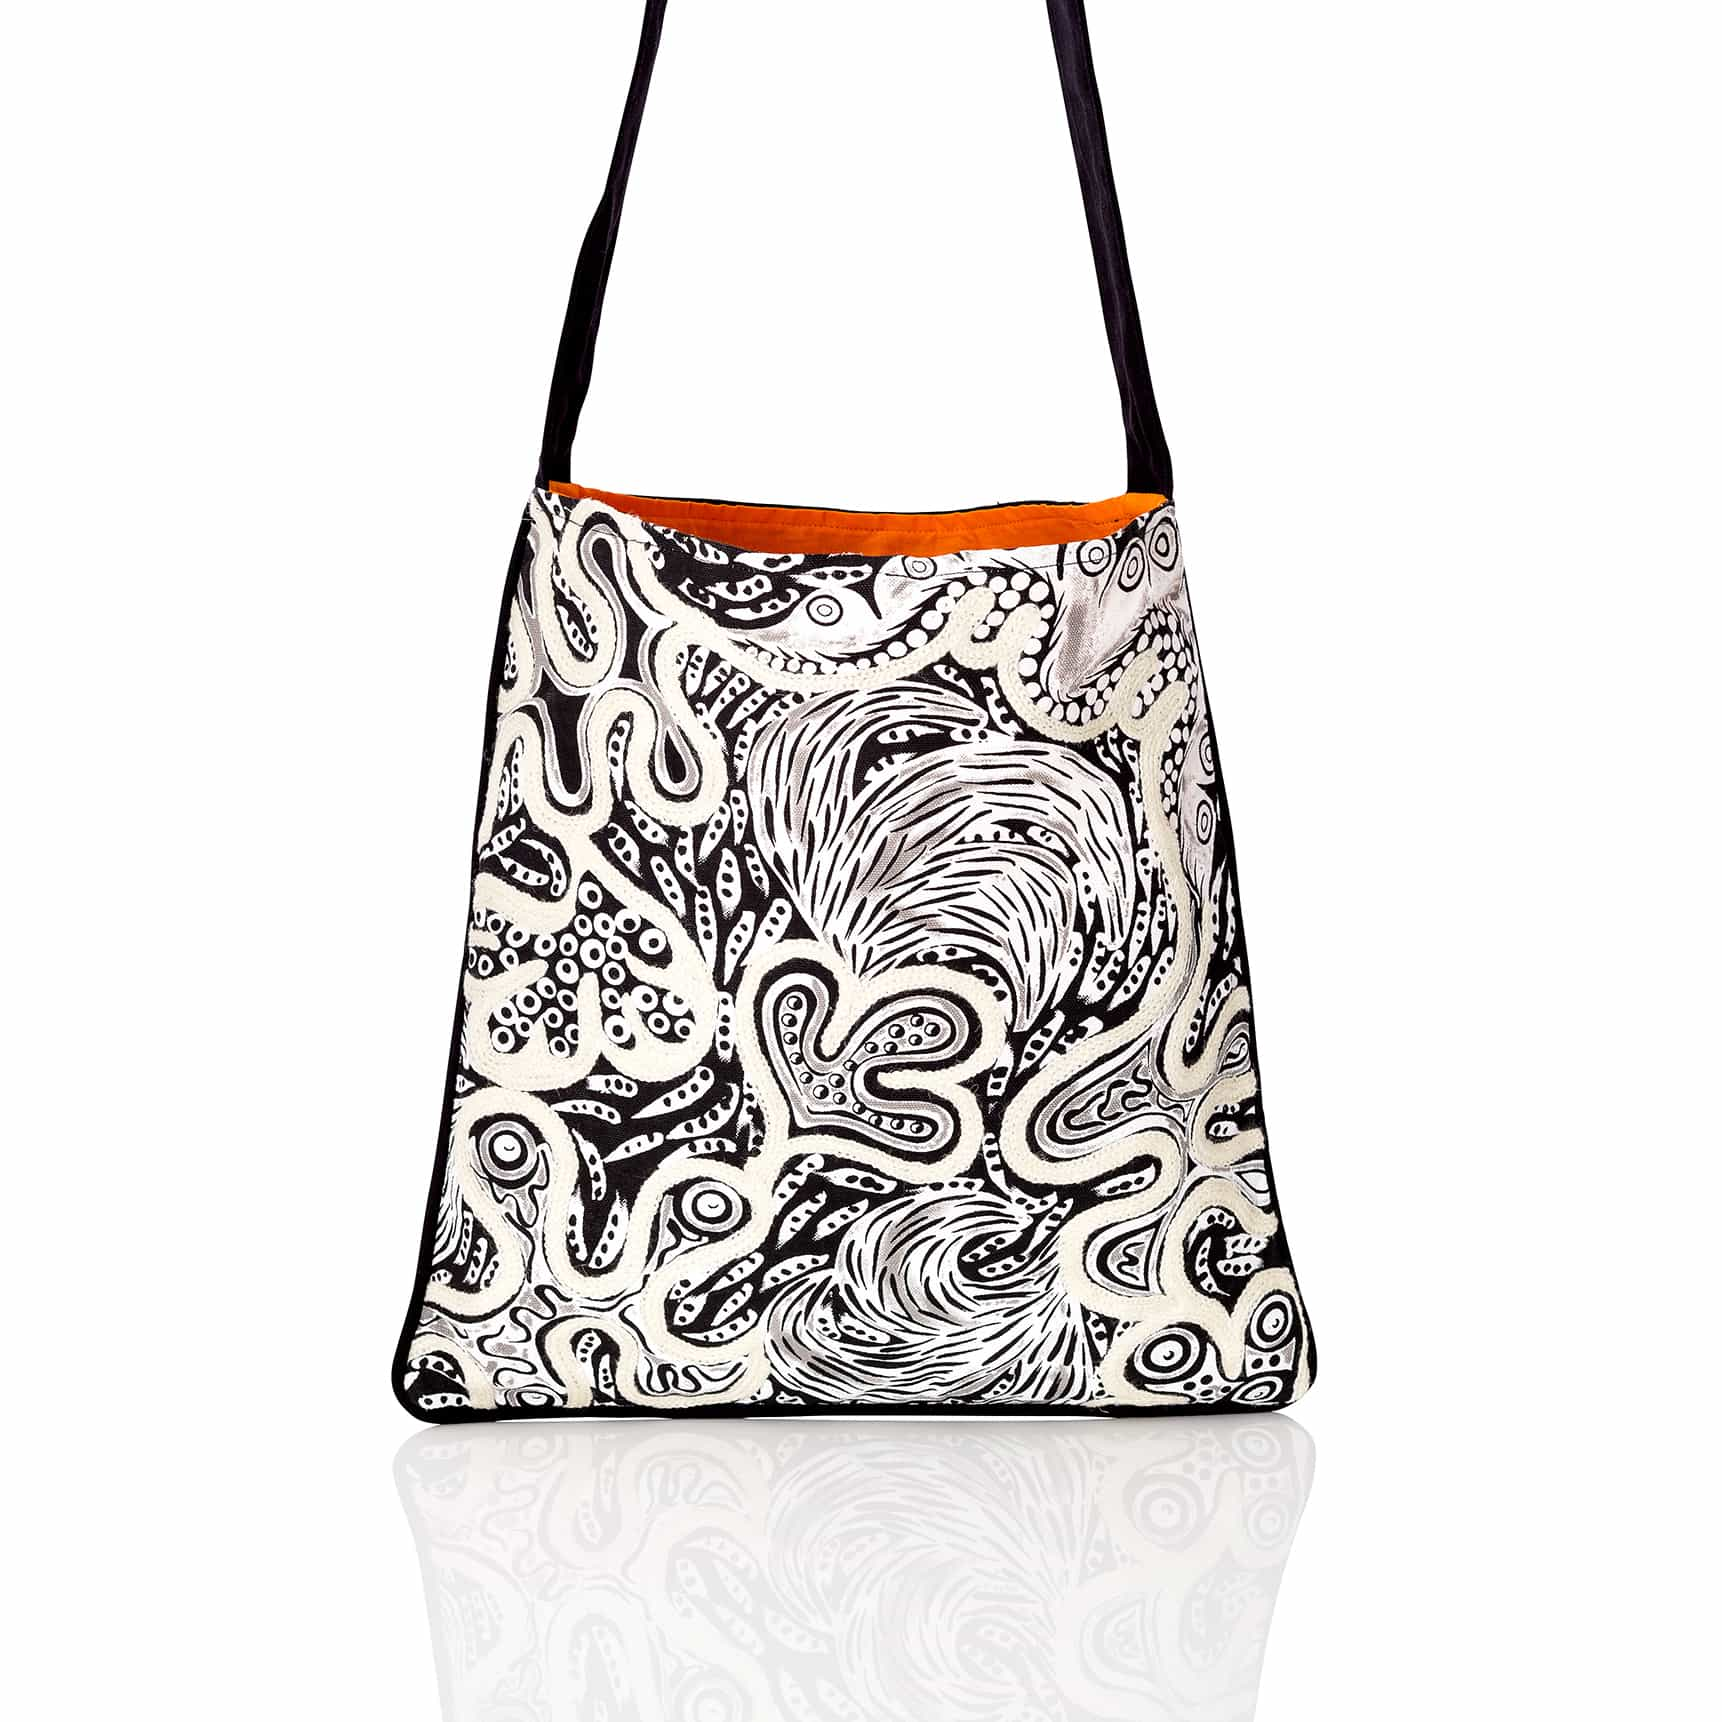 Bags -Medium Canvas Tote-KKU710 – Better World Arts 23326e158dc2a